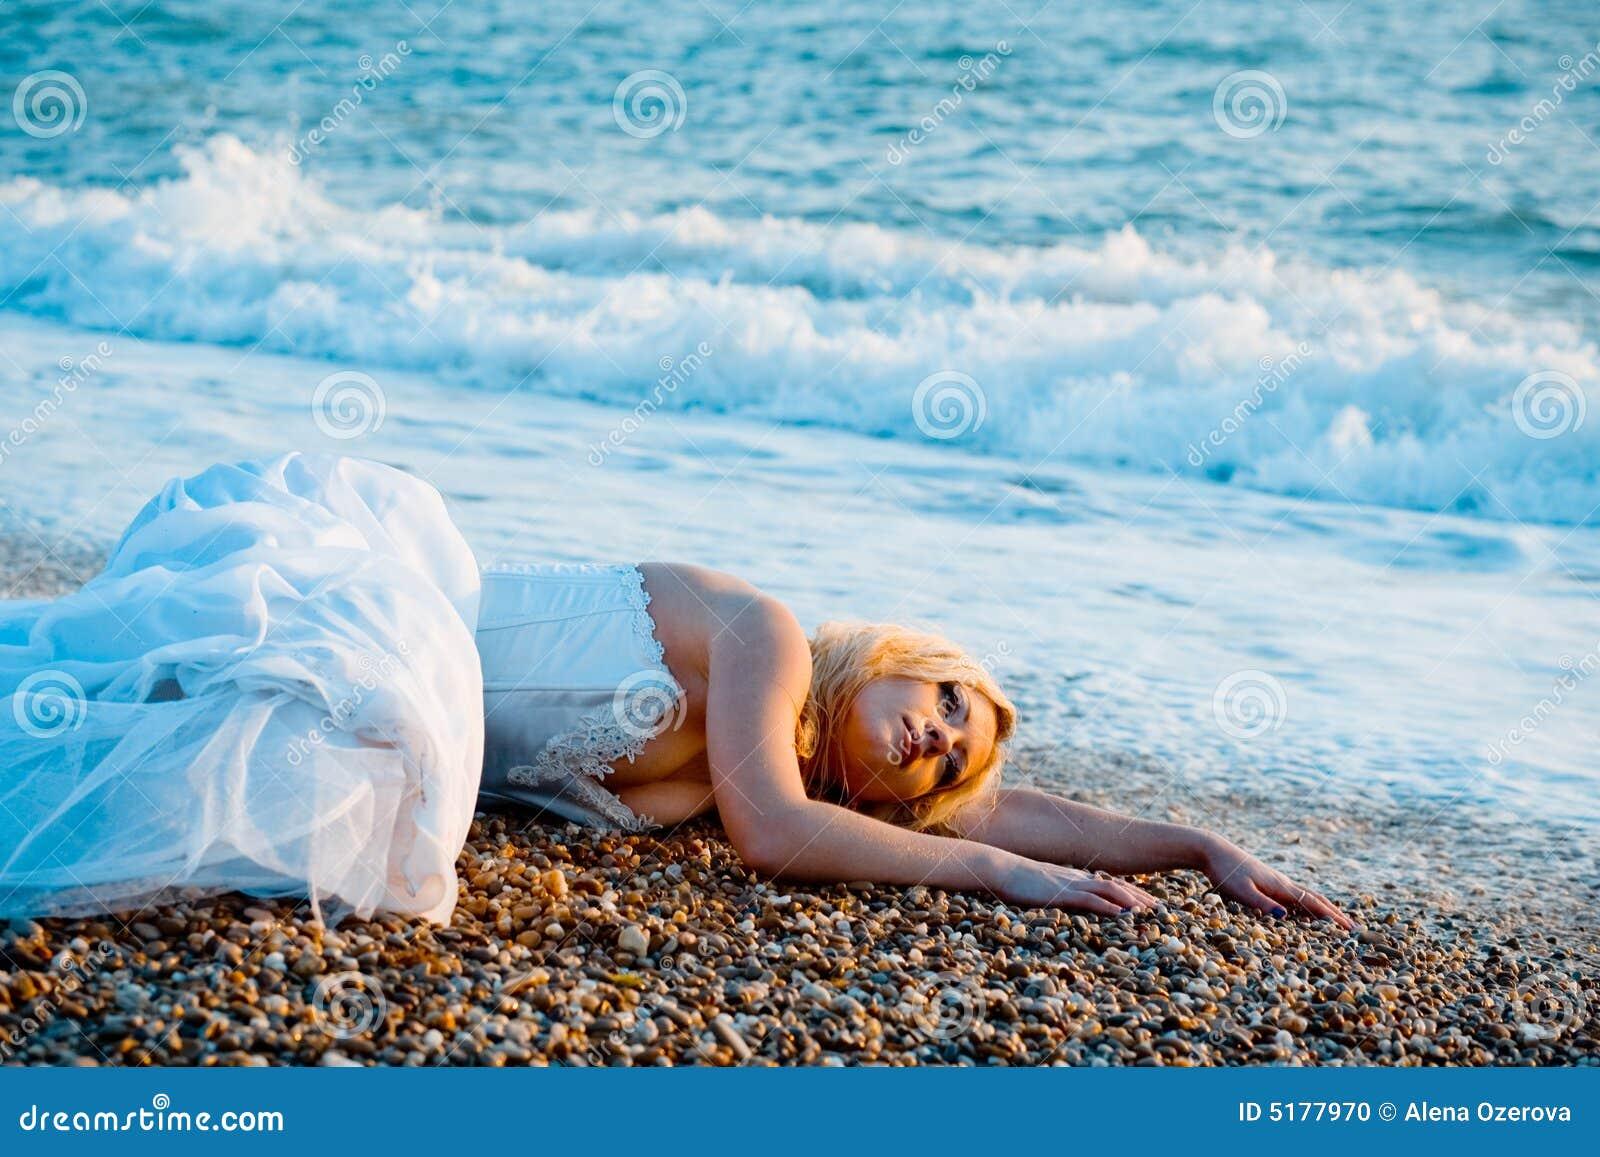 Trash the wedding dress stock photo. Image of person, femininity ...